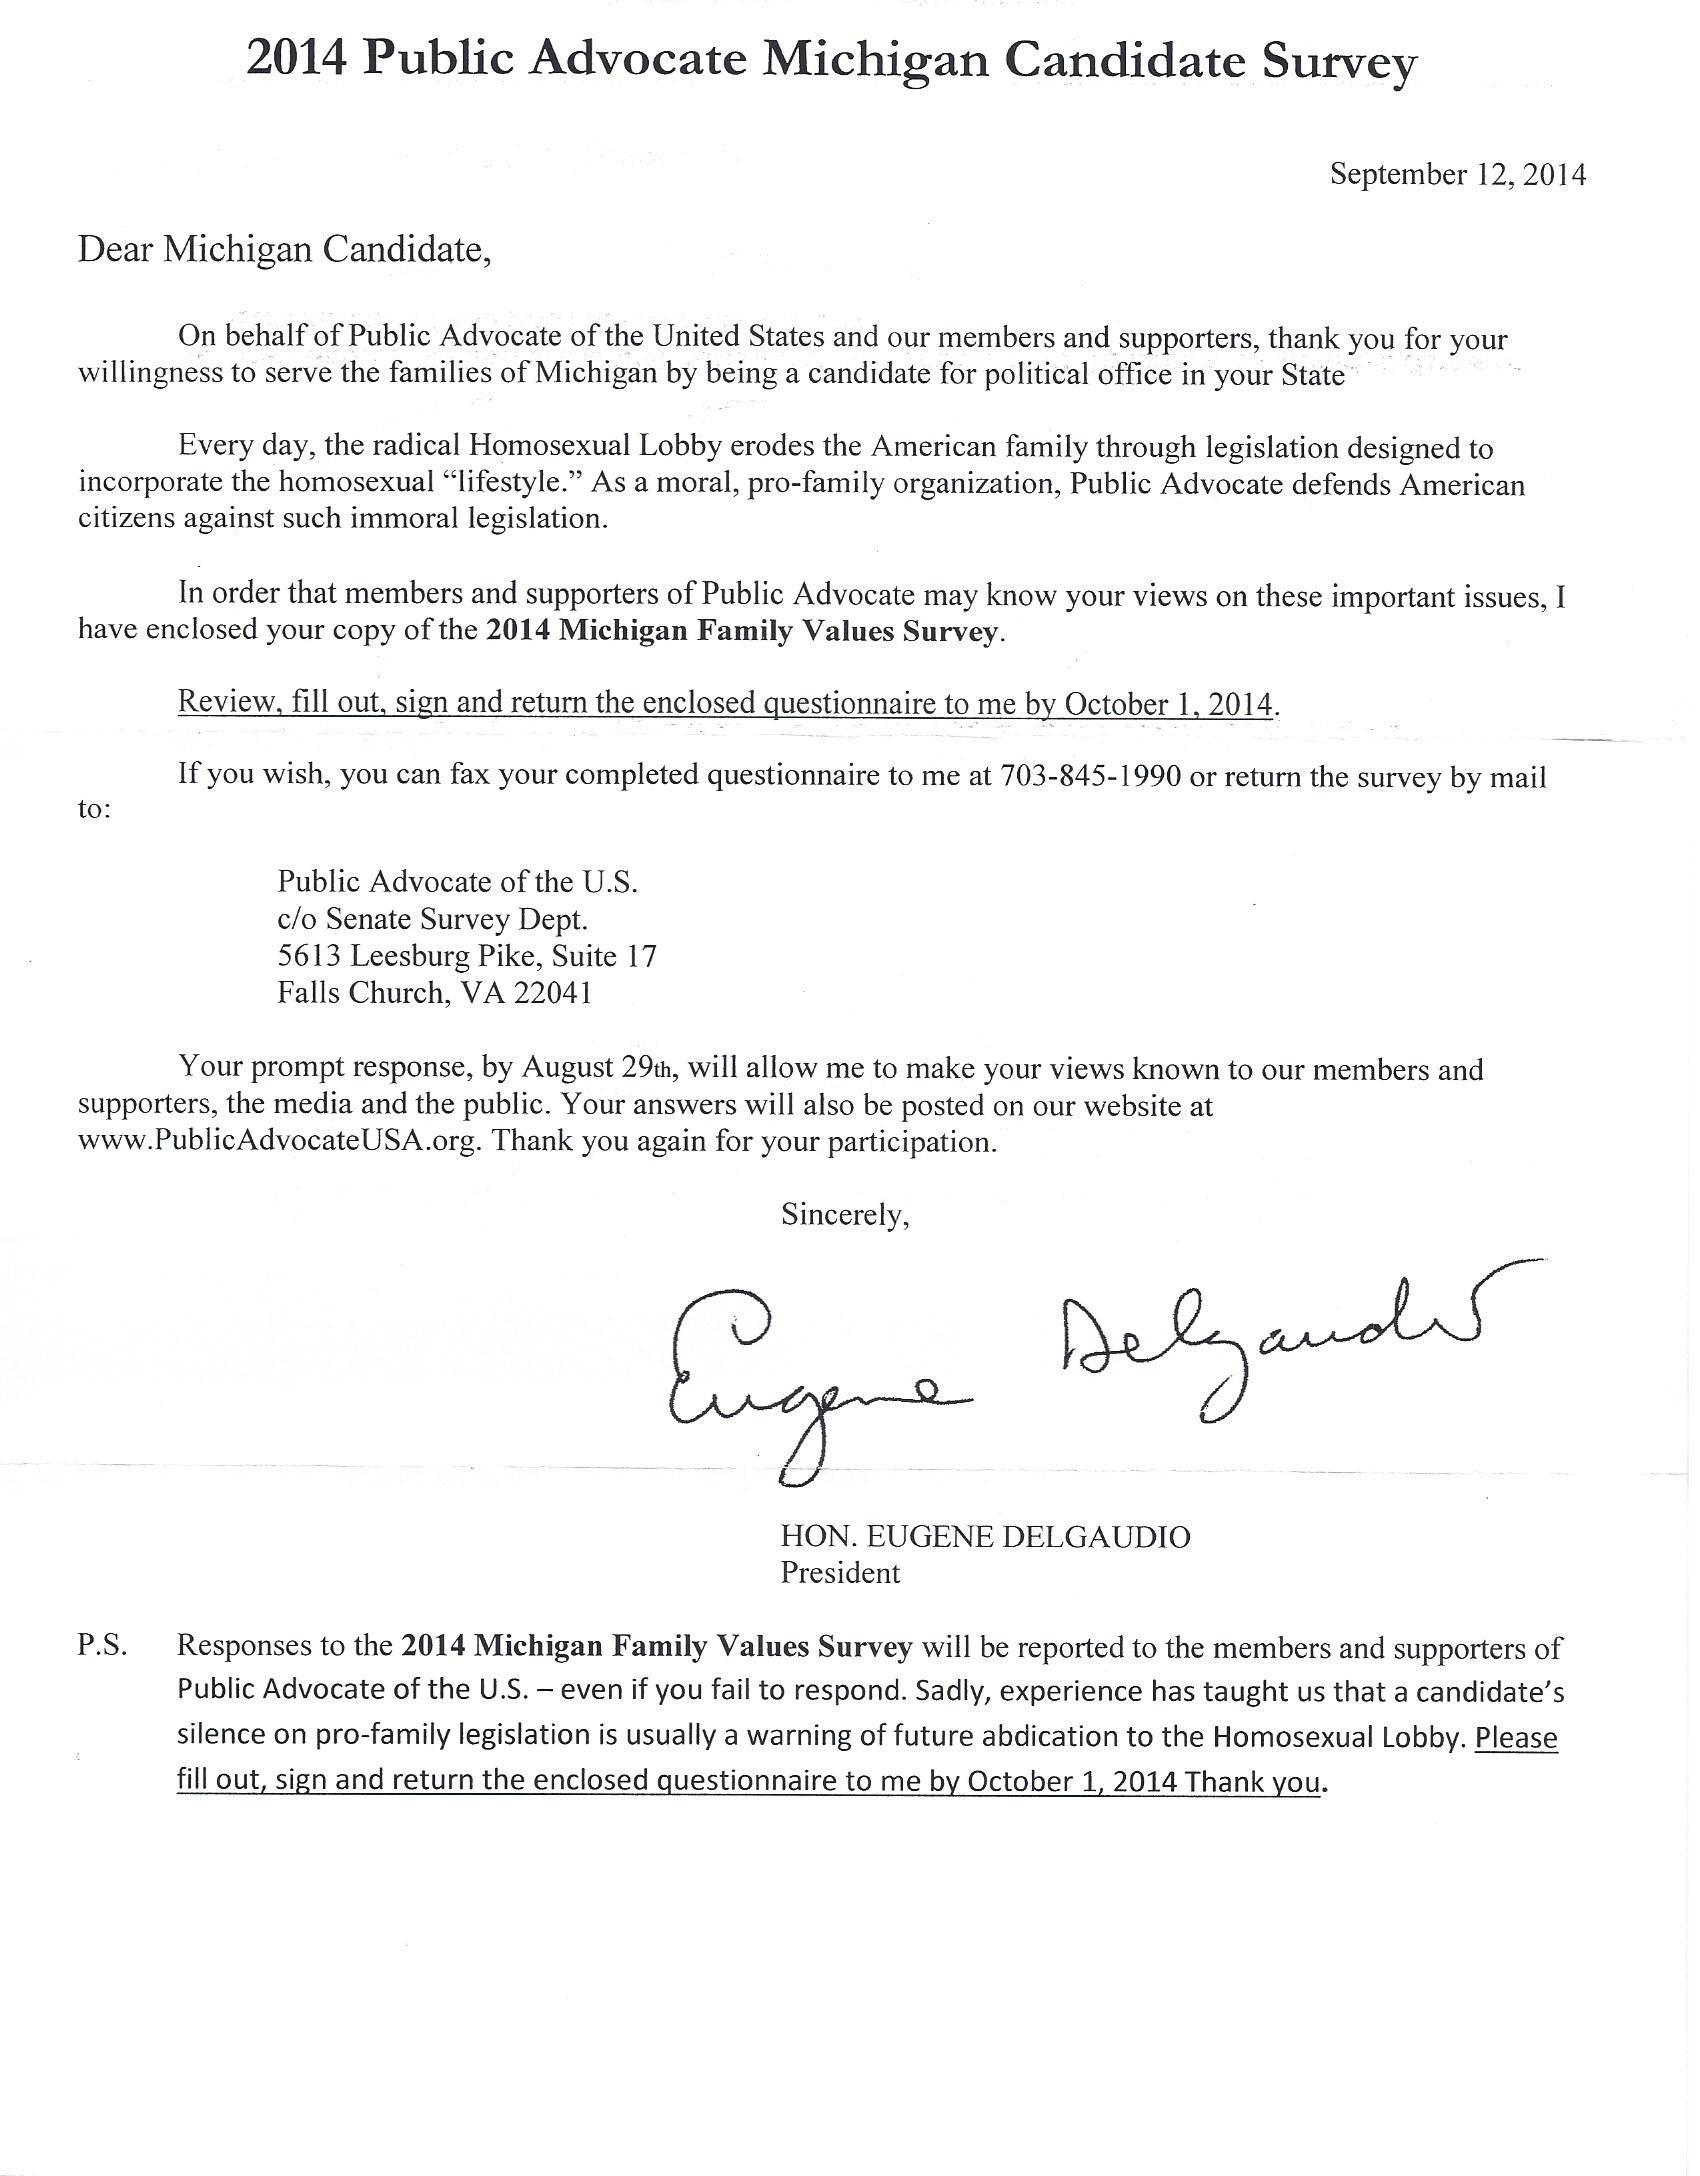 Government Job Cover Letter Template - Cover Letter Help Harvard Footballvolunteer Letter Template